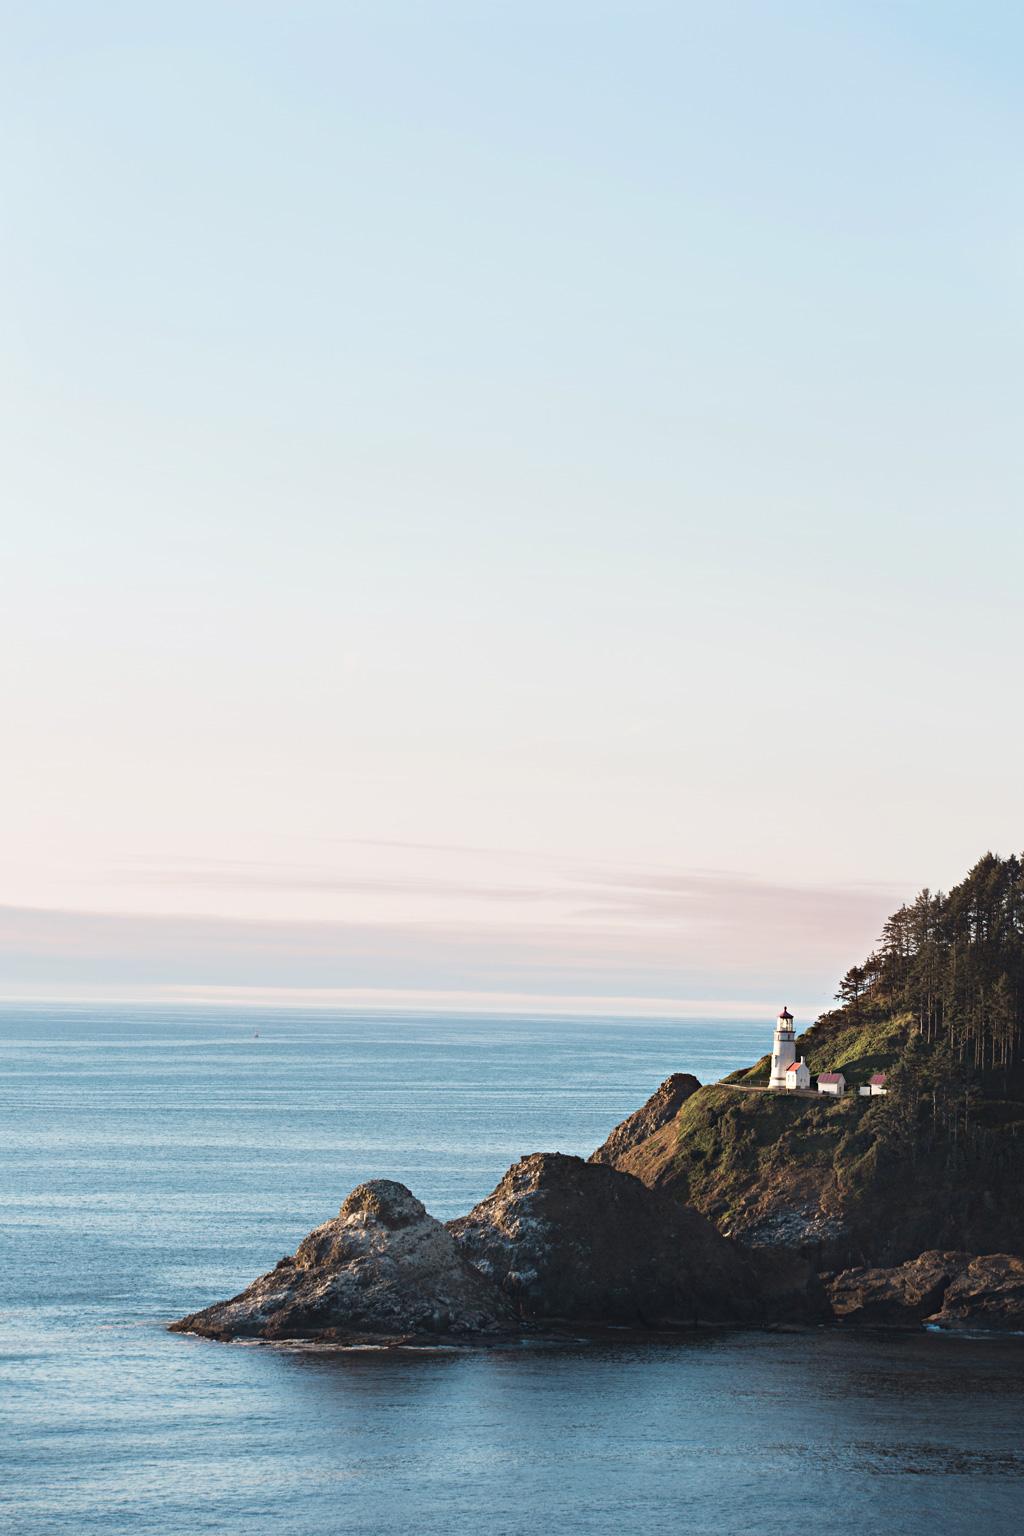 CindyGiovagnoli_Crater_Lake_National_Park_Cape_Perpetua_Heceta_Head_lighthouse_Pacific_Ocean_Cannon_Beach_haystack_Oregon_coast-012.jpg